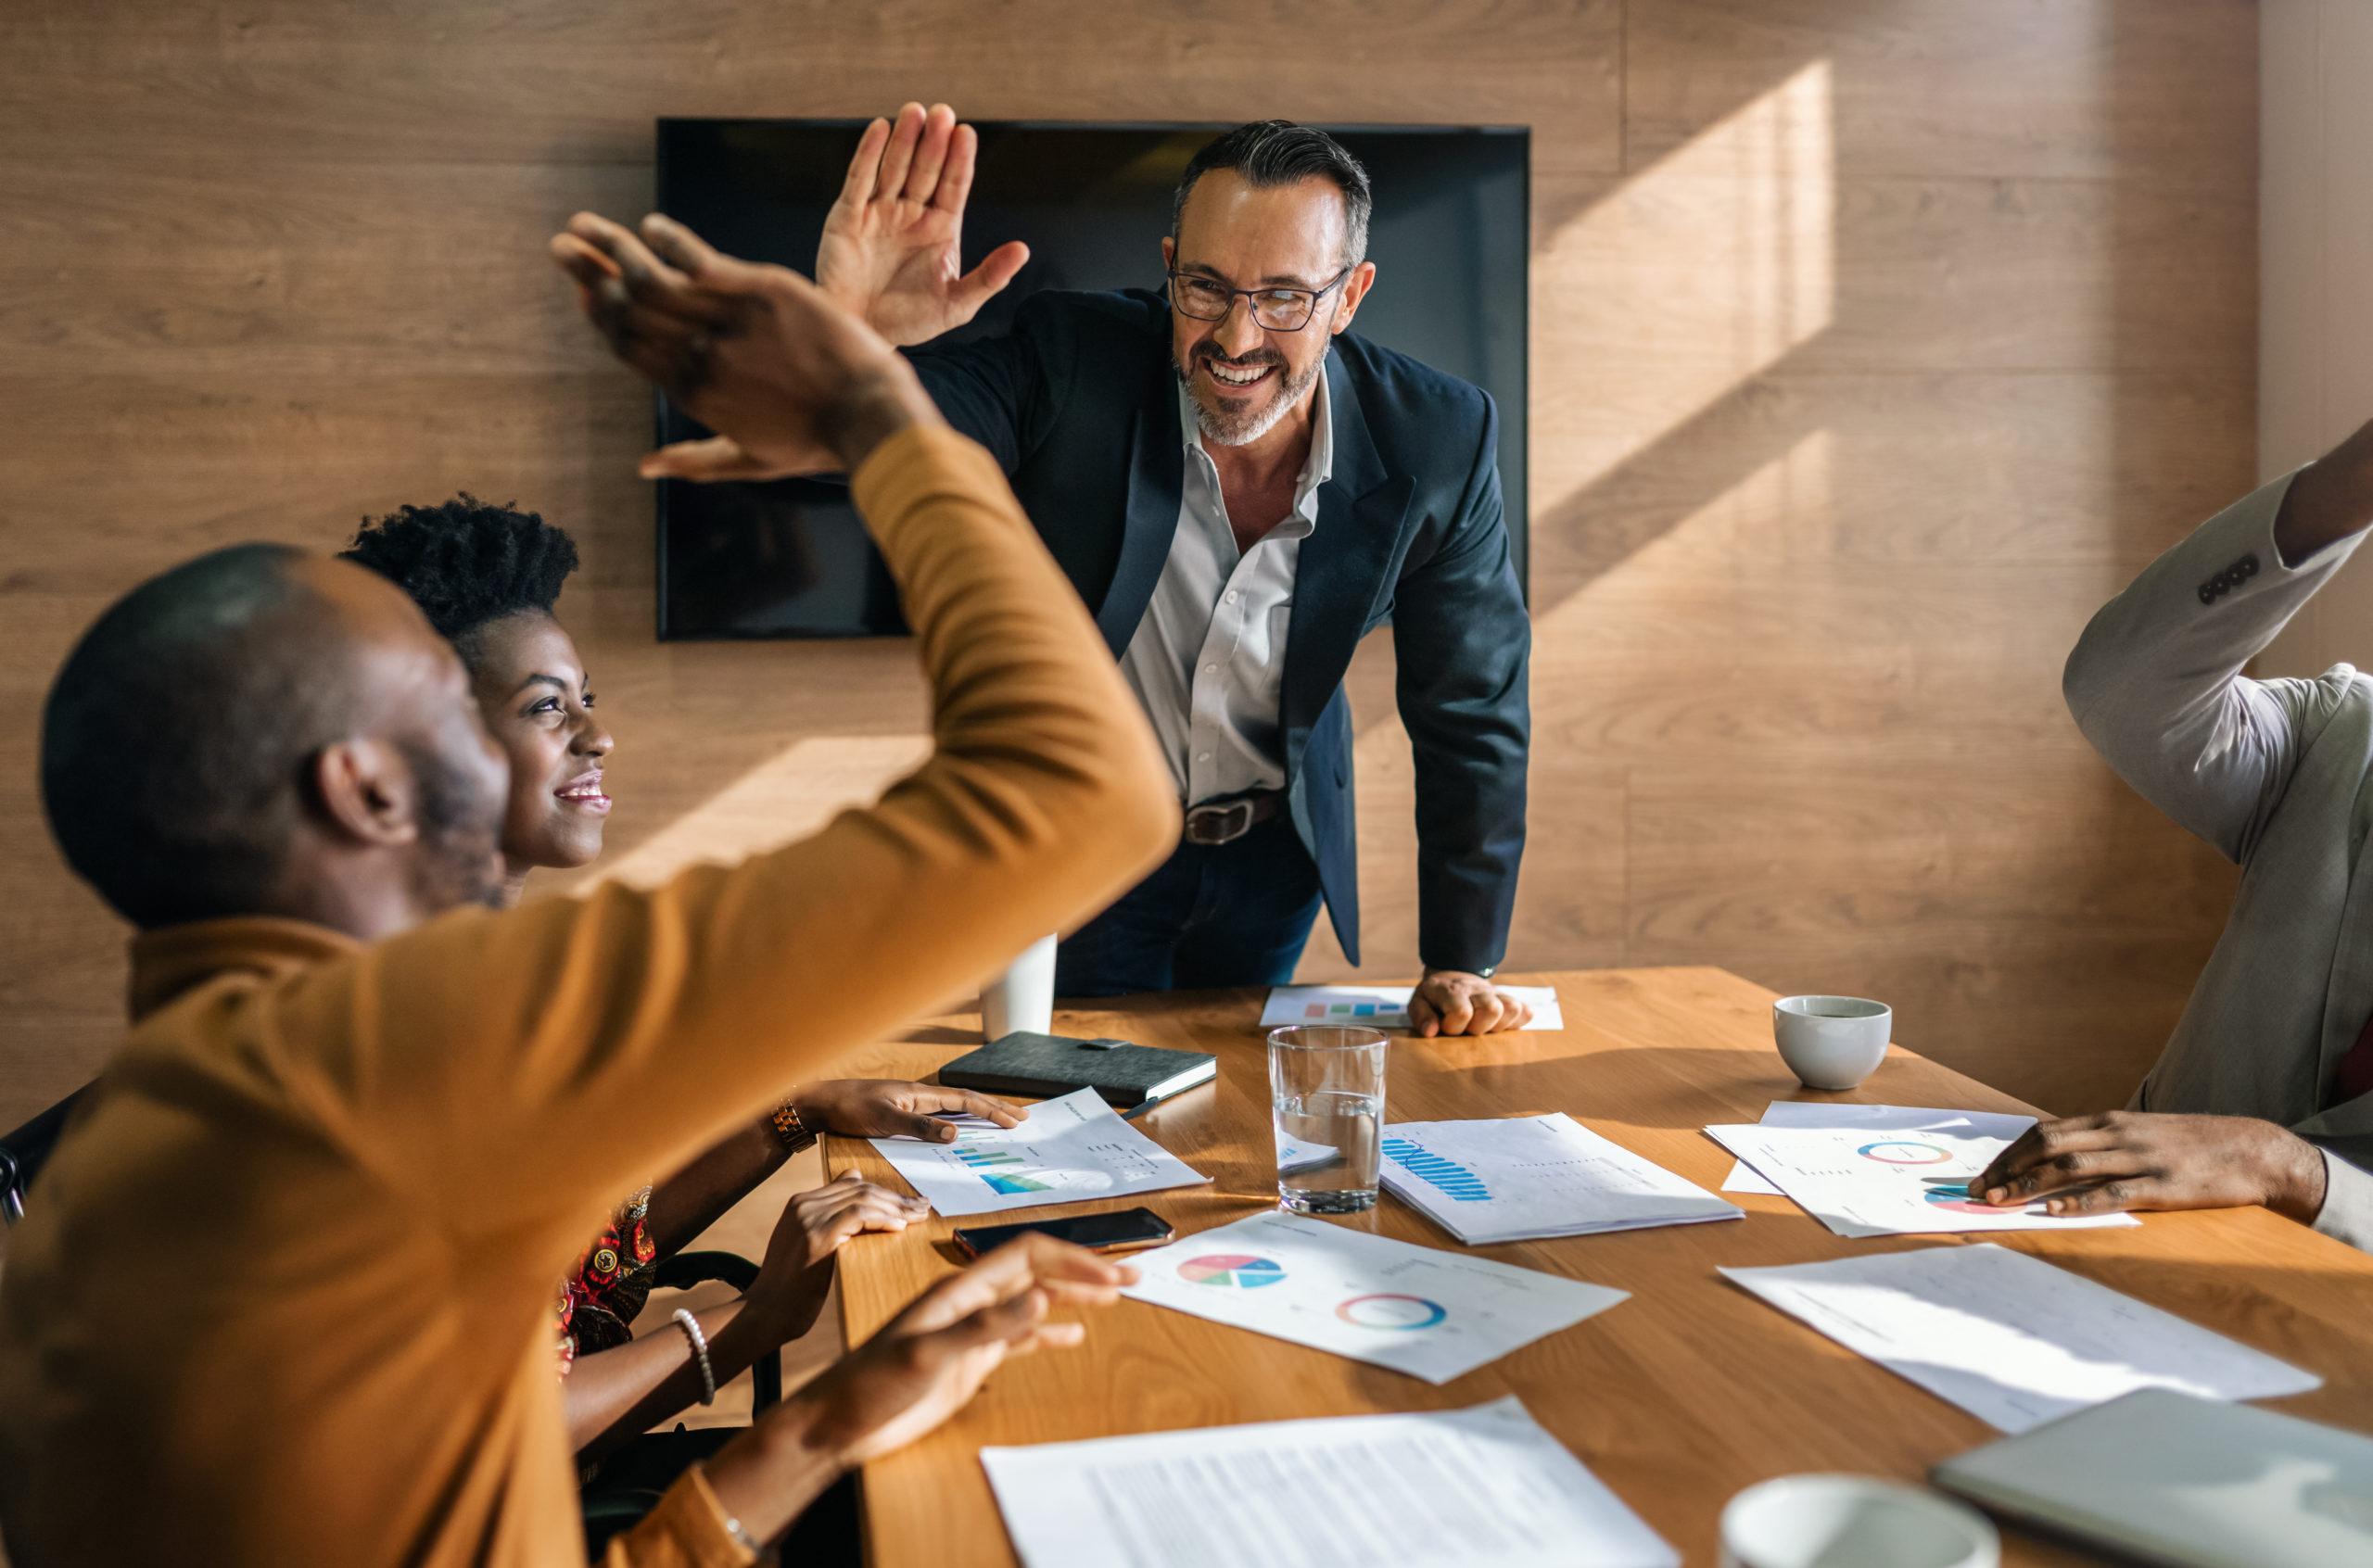 employee and boss relationships